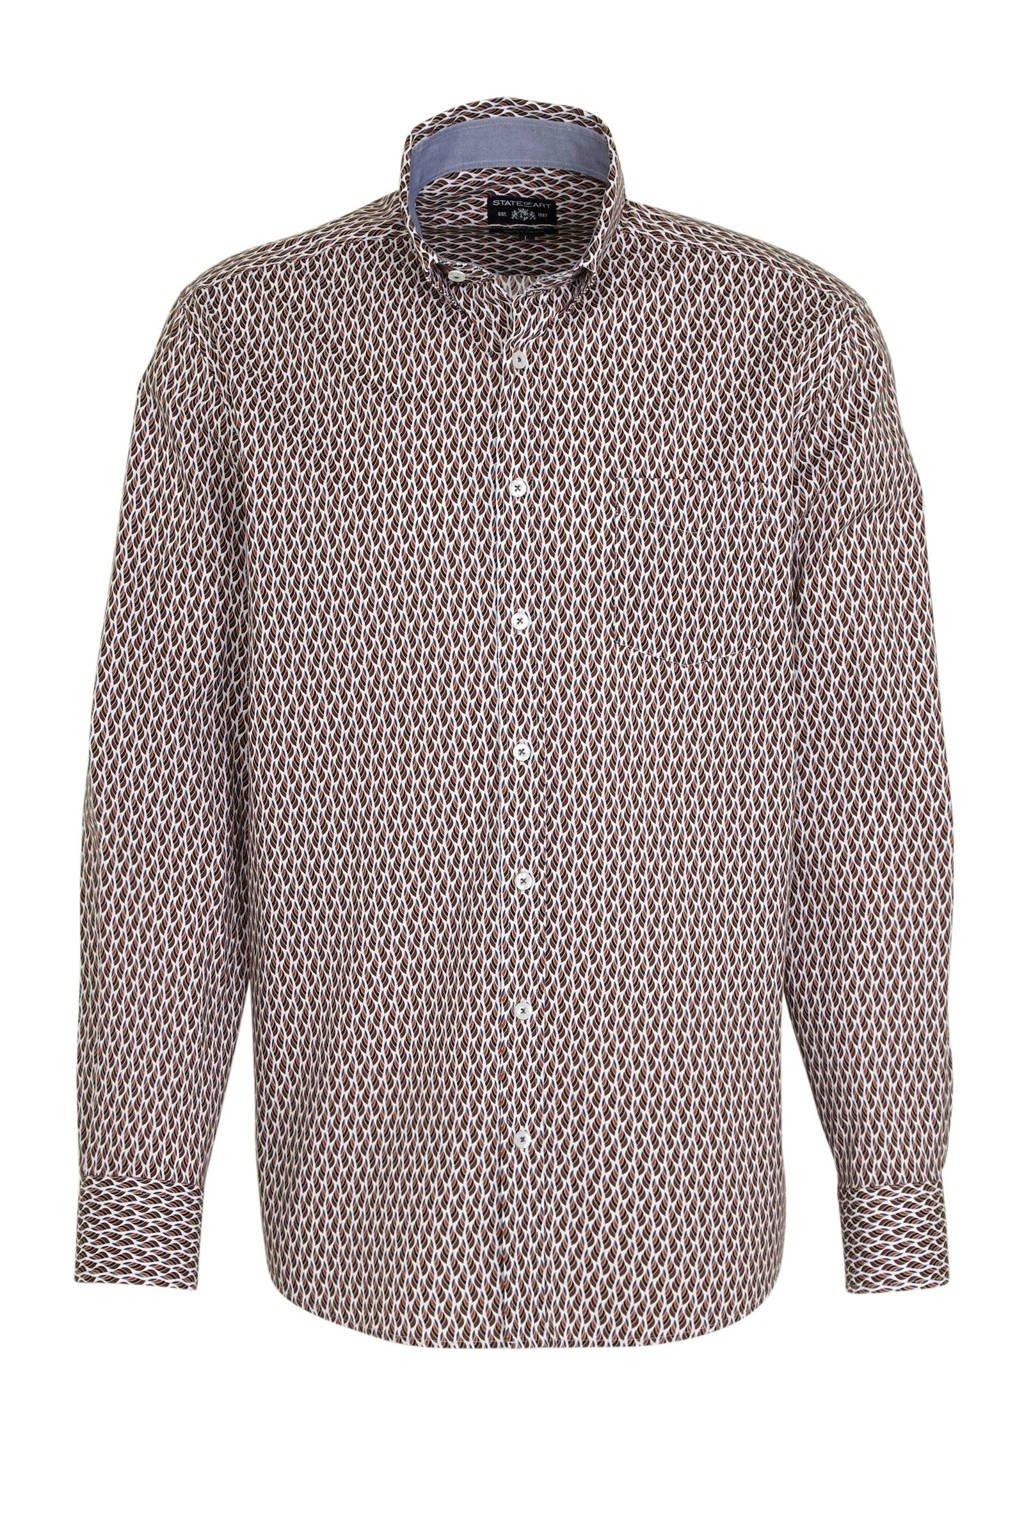 State of Art regular fit overhemd met all over print brique/donkerblauw, Brique/donkerblauw